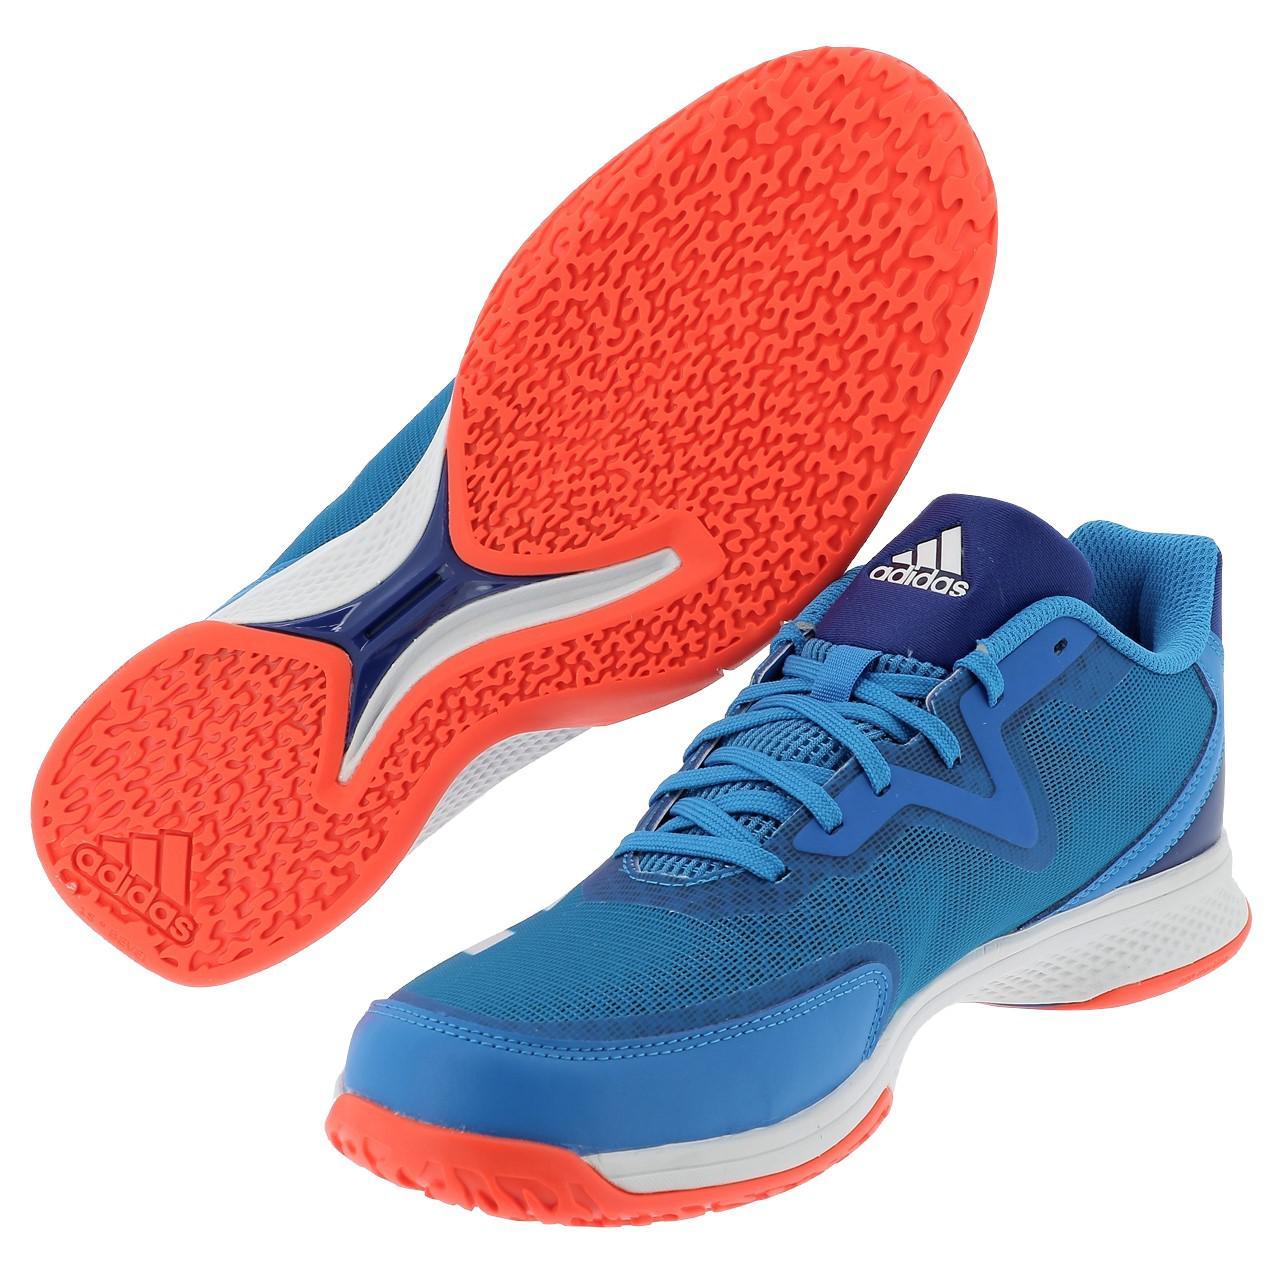 Chaussures de handball, tous les postes seront bien servis !